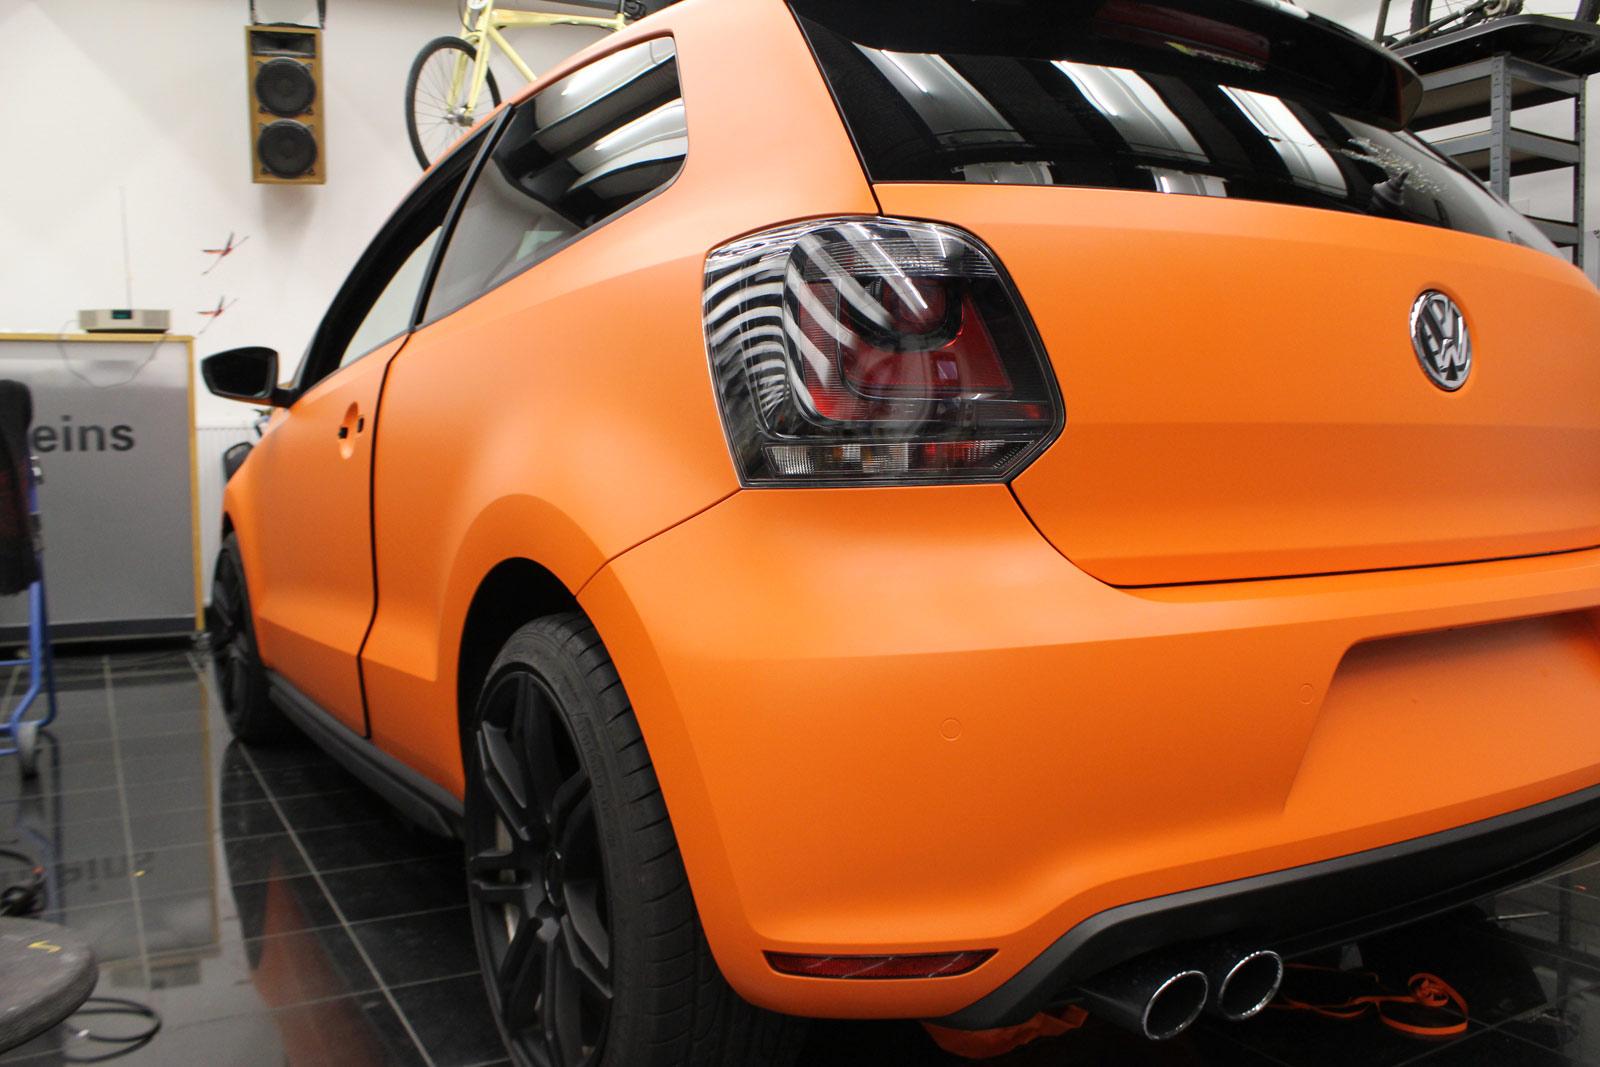 VW_Polo_GTI_Folierung_Orange_Matt_14